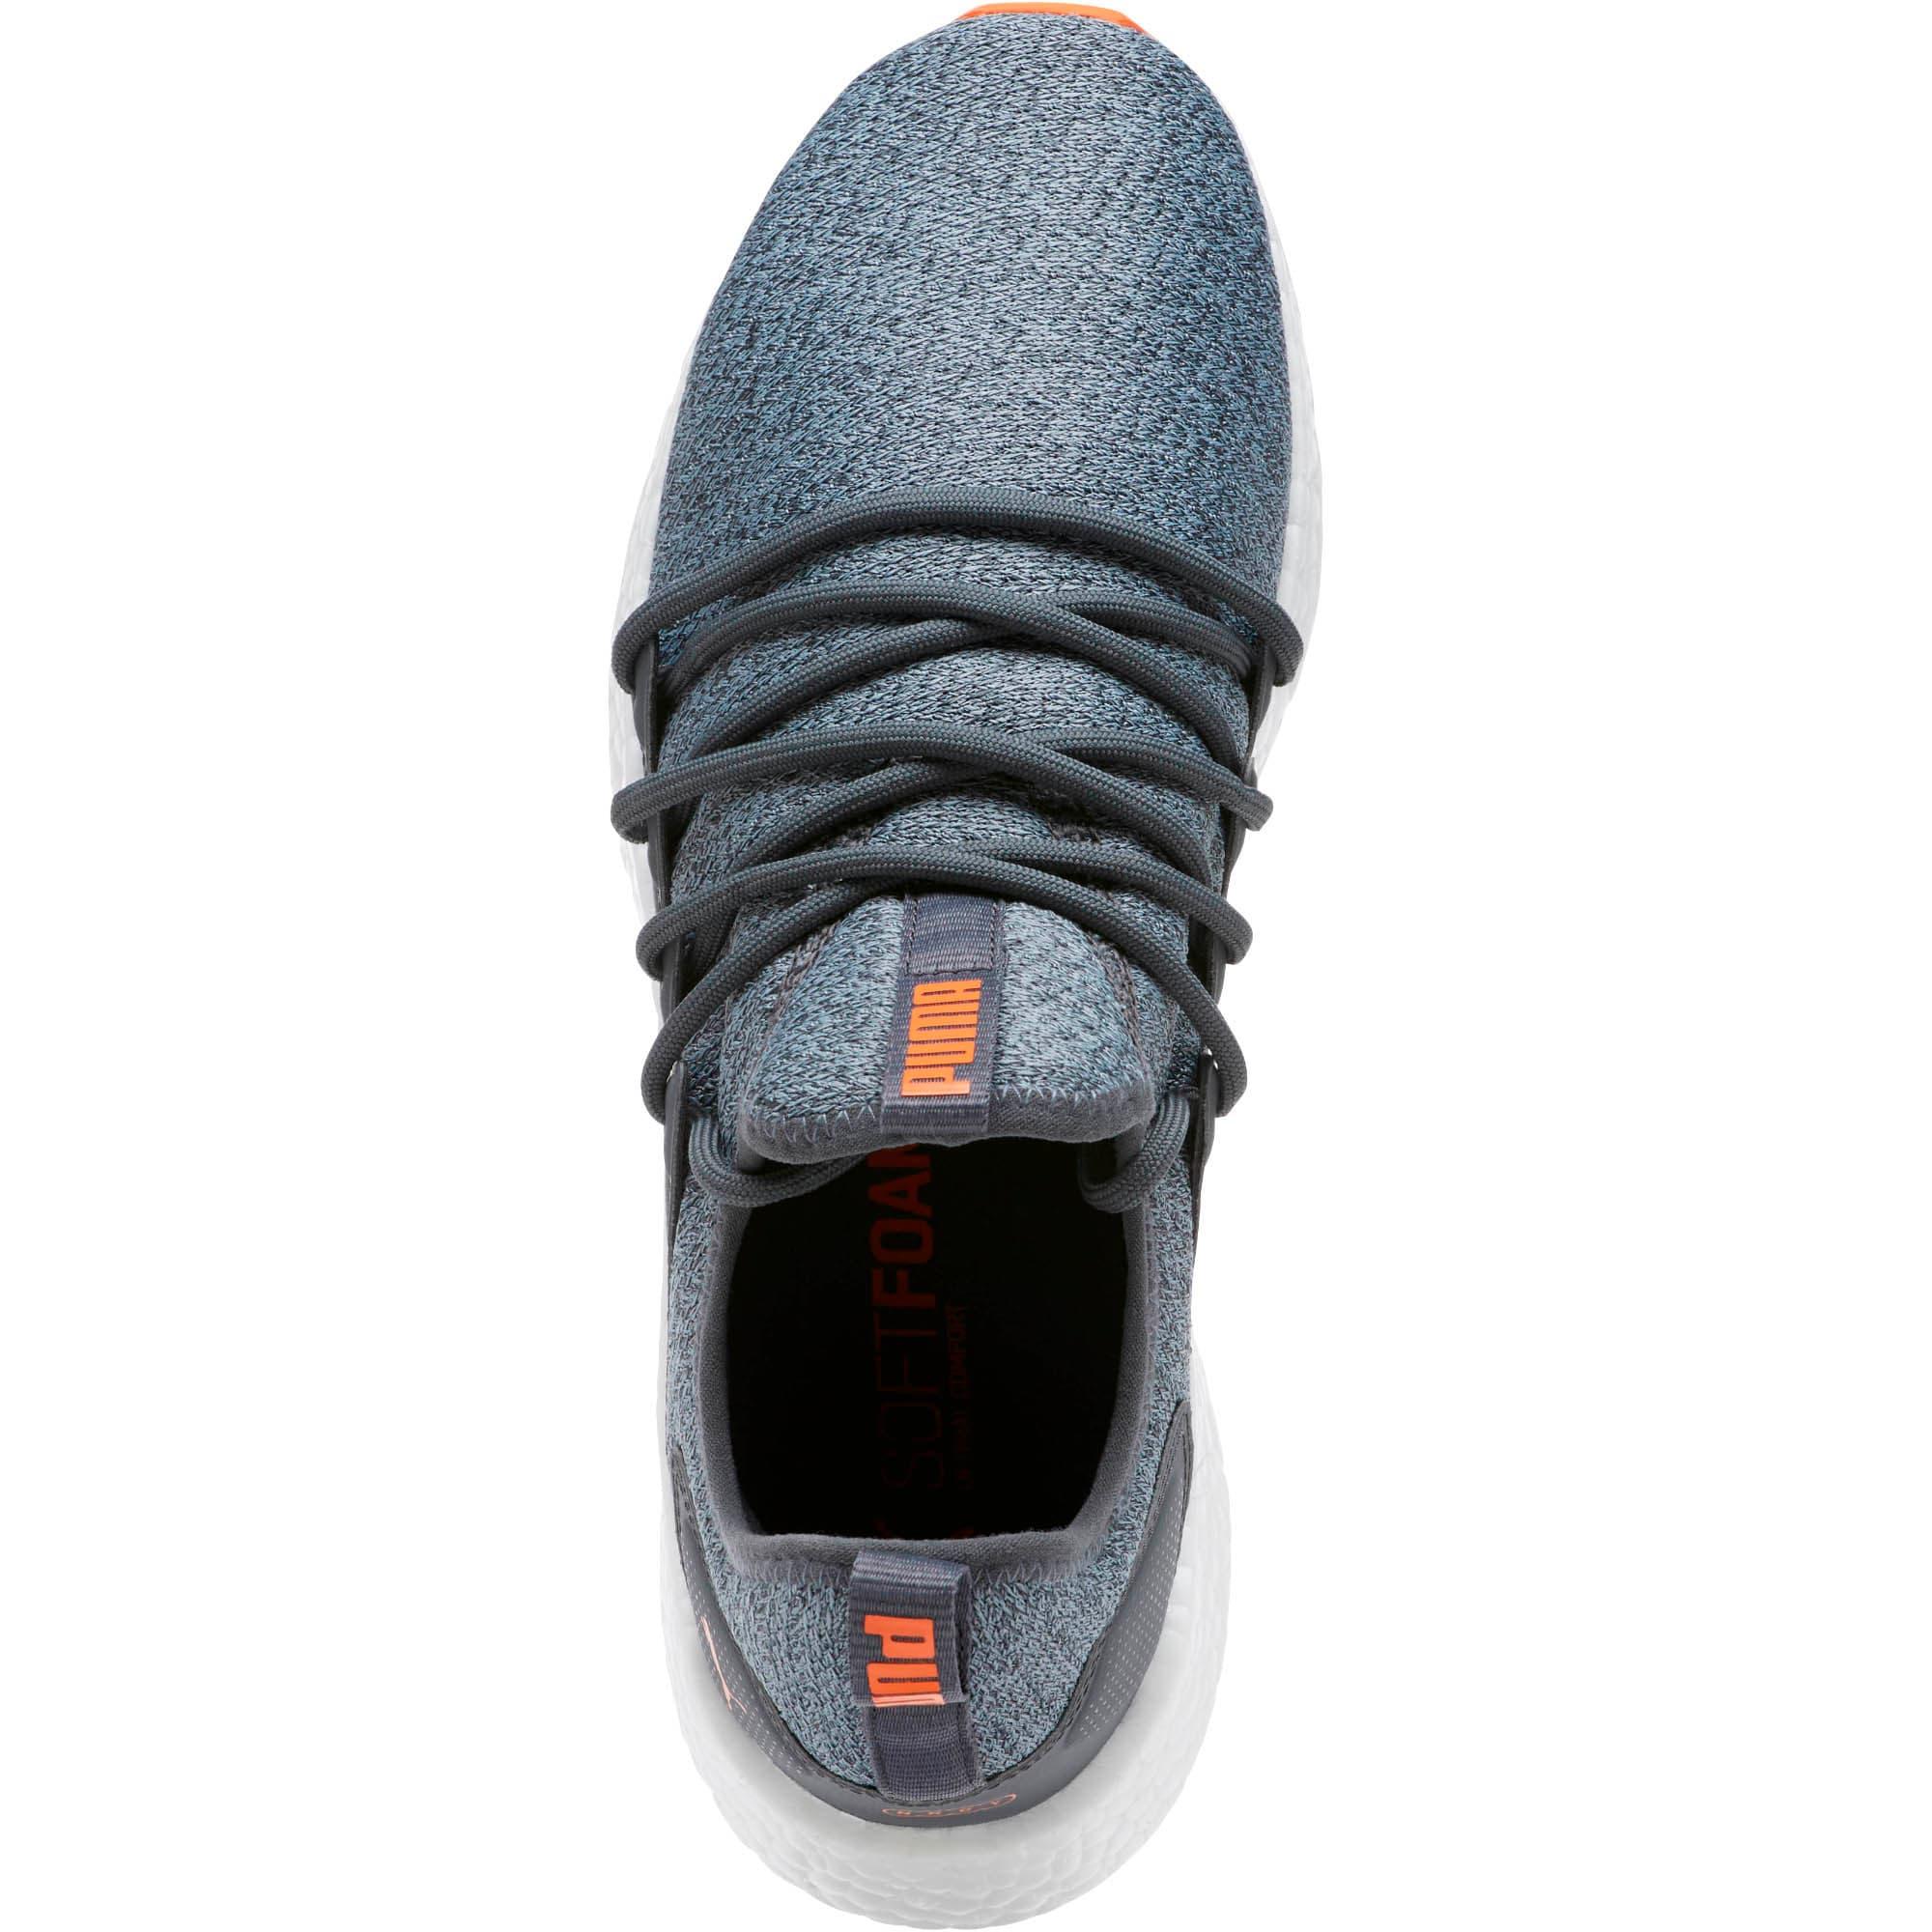 Thumbnail 5 of NRGY Neko Knit Men's Running Shoes, Iron Gate-Firecracker, medium